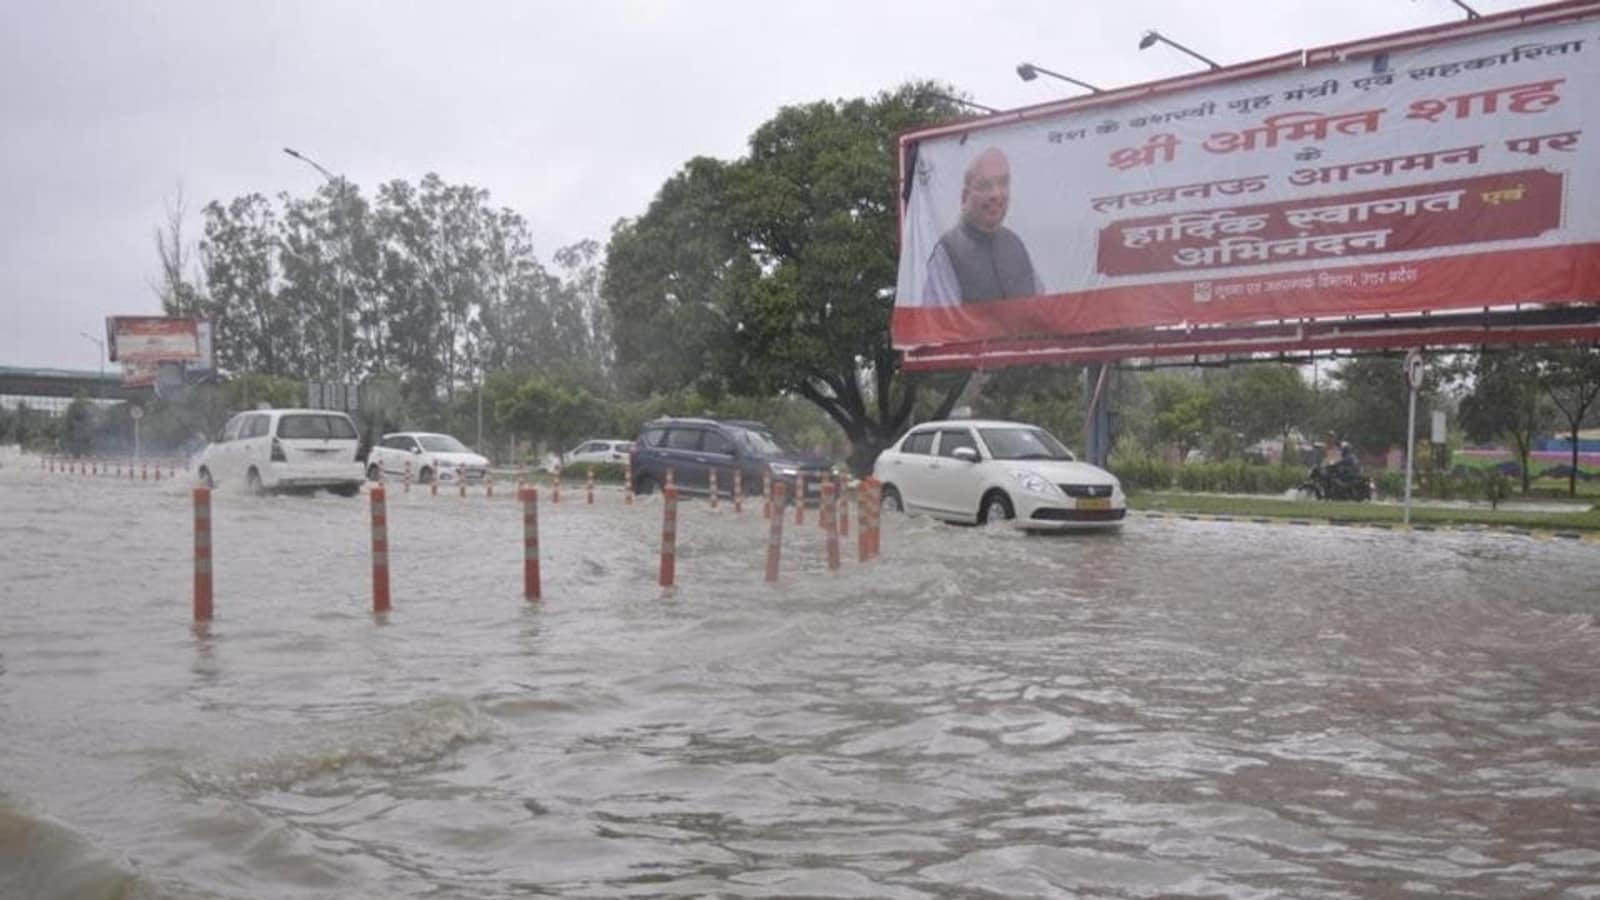 Schools, colleges in Uttar Pradesh to remain shut on Friday, Saturday amid heavy rainfall